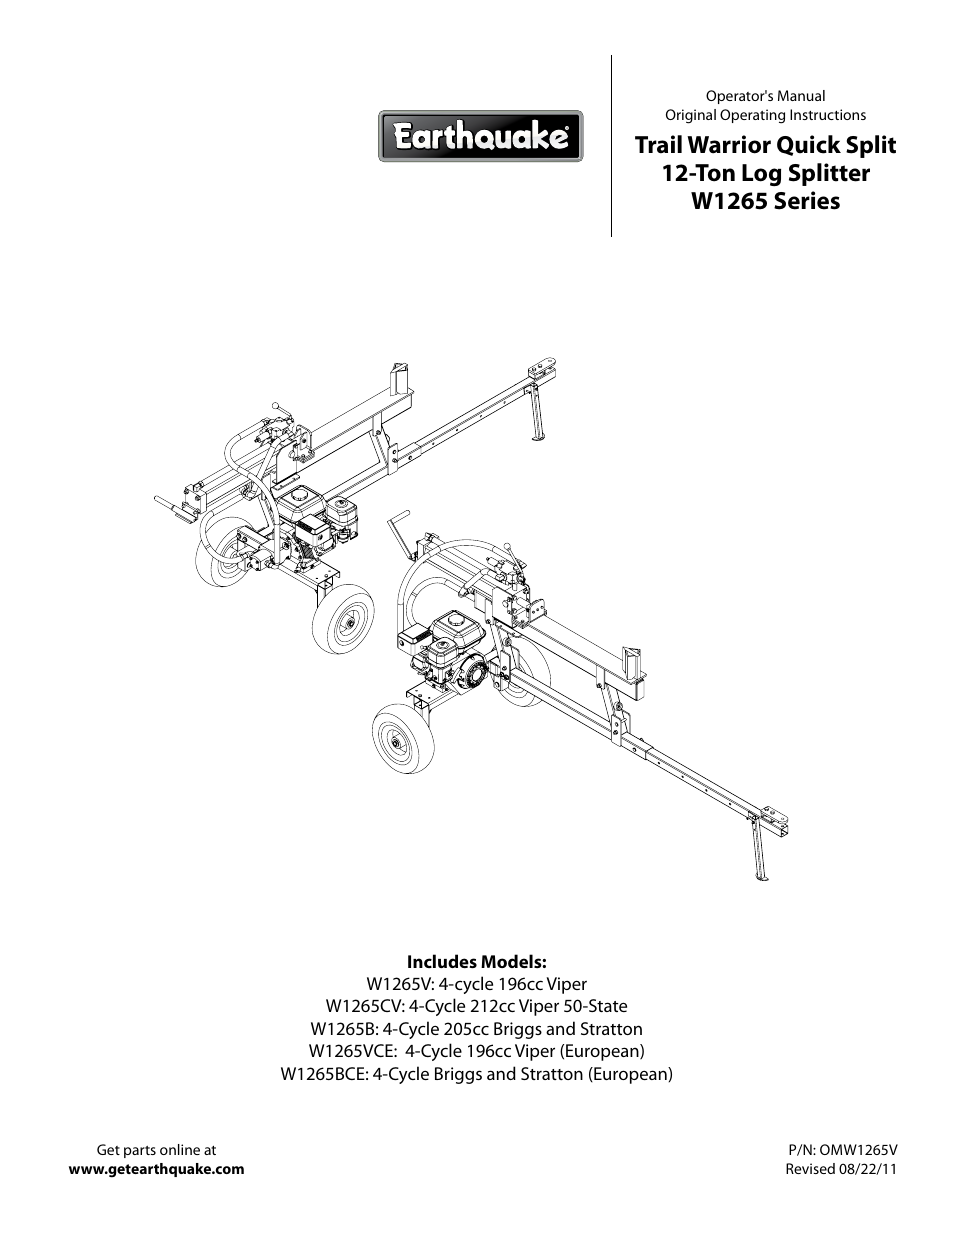 earthquake w1265v user manual